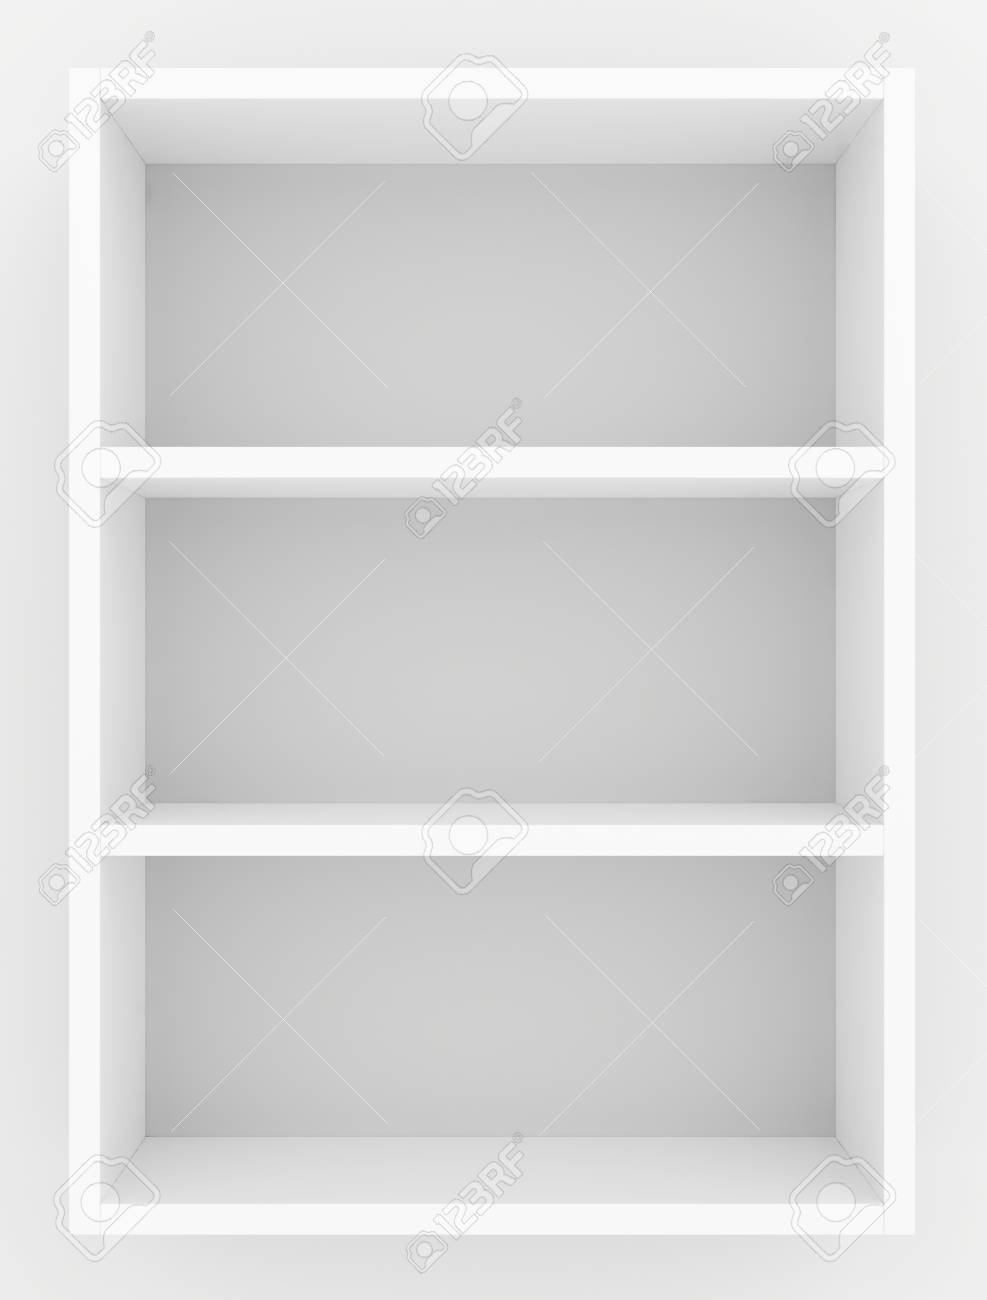 White blank showcase shelves front view. 3D rendering. - 72168920